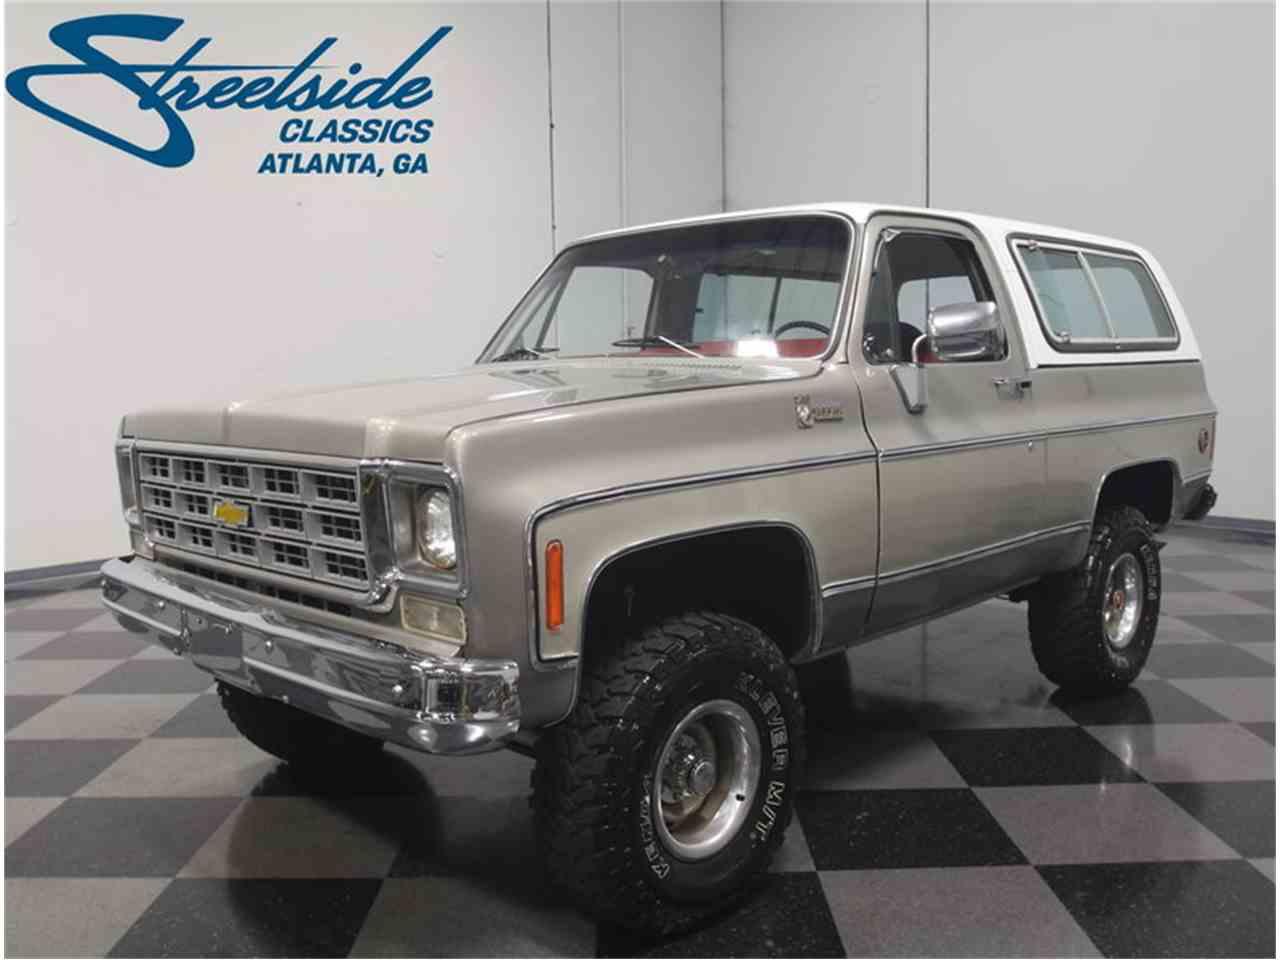 Classic Chevrolet Blazer for Sale on ClassicCars.com - Pg 2